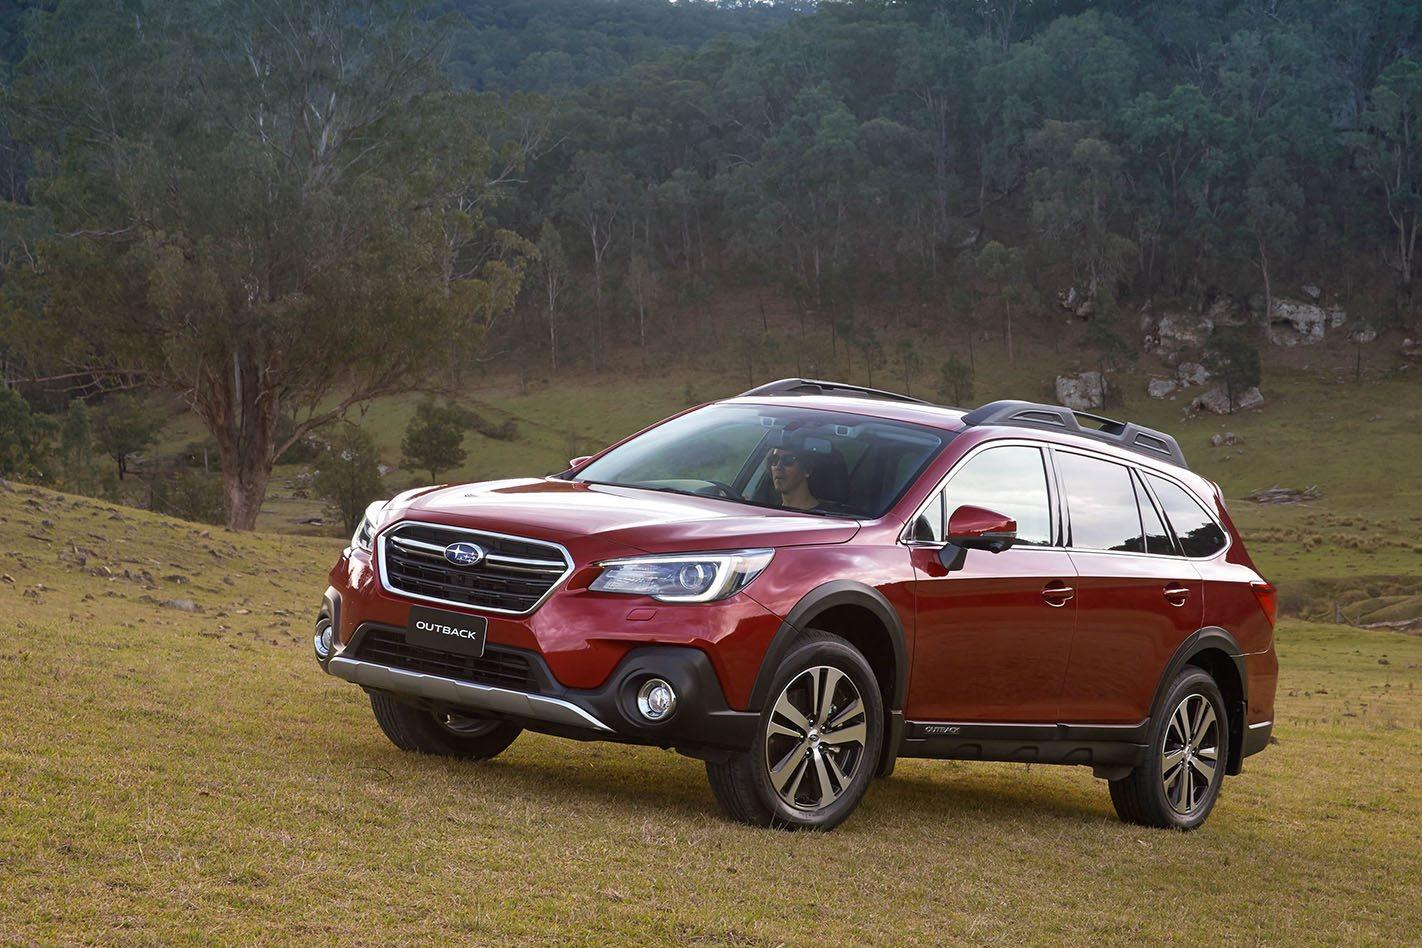 2018 subaru outback 2.5 i limited owners manual